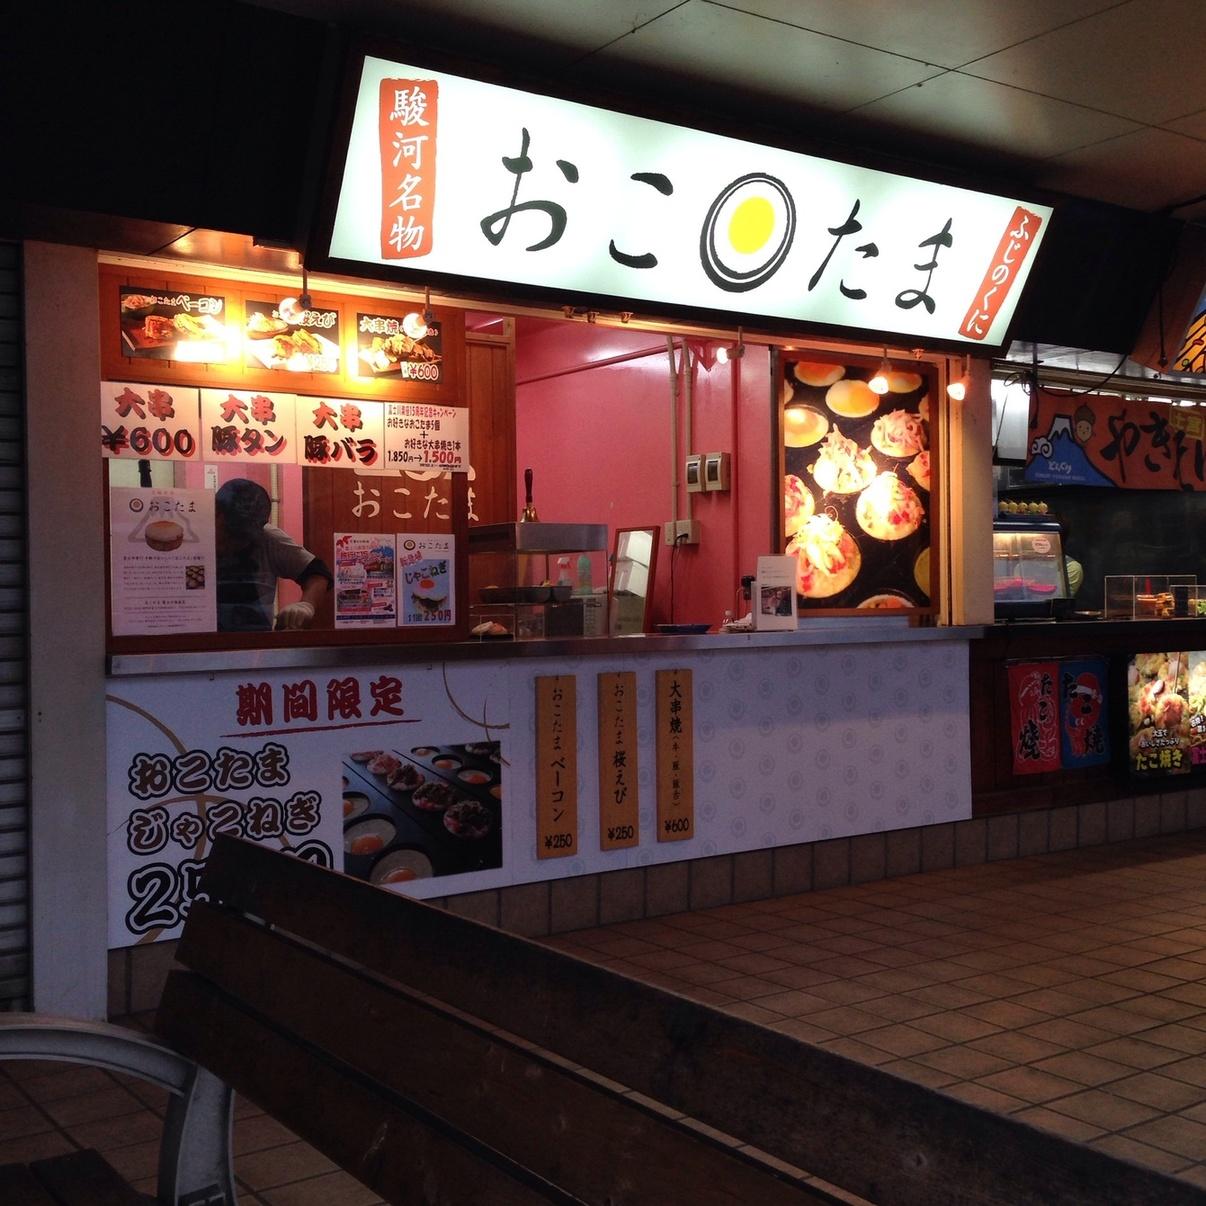 おこたま本舗 富士川楽座店